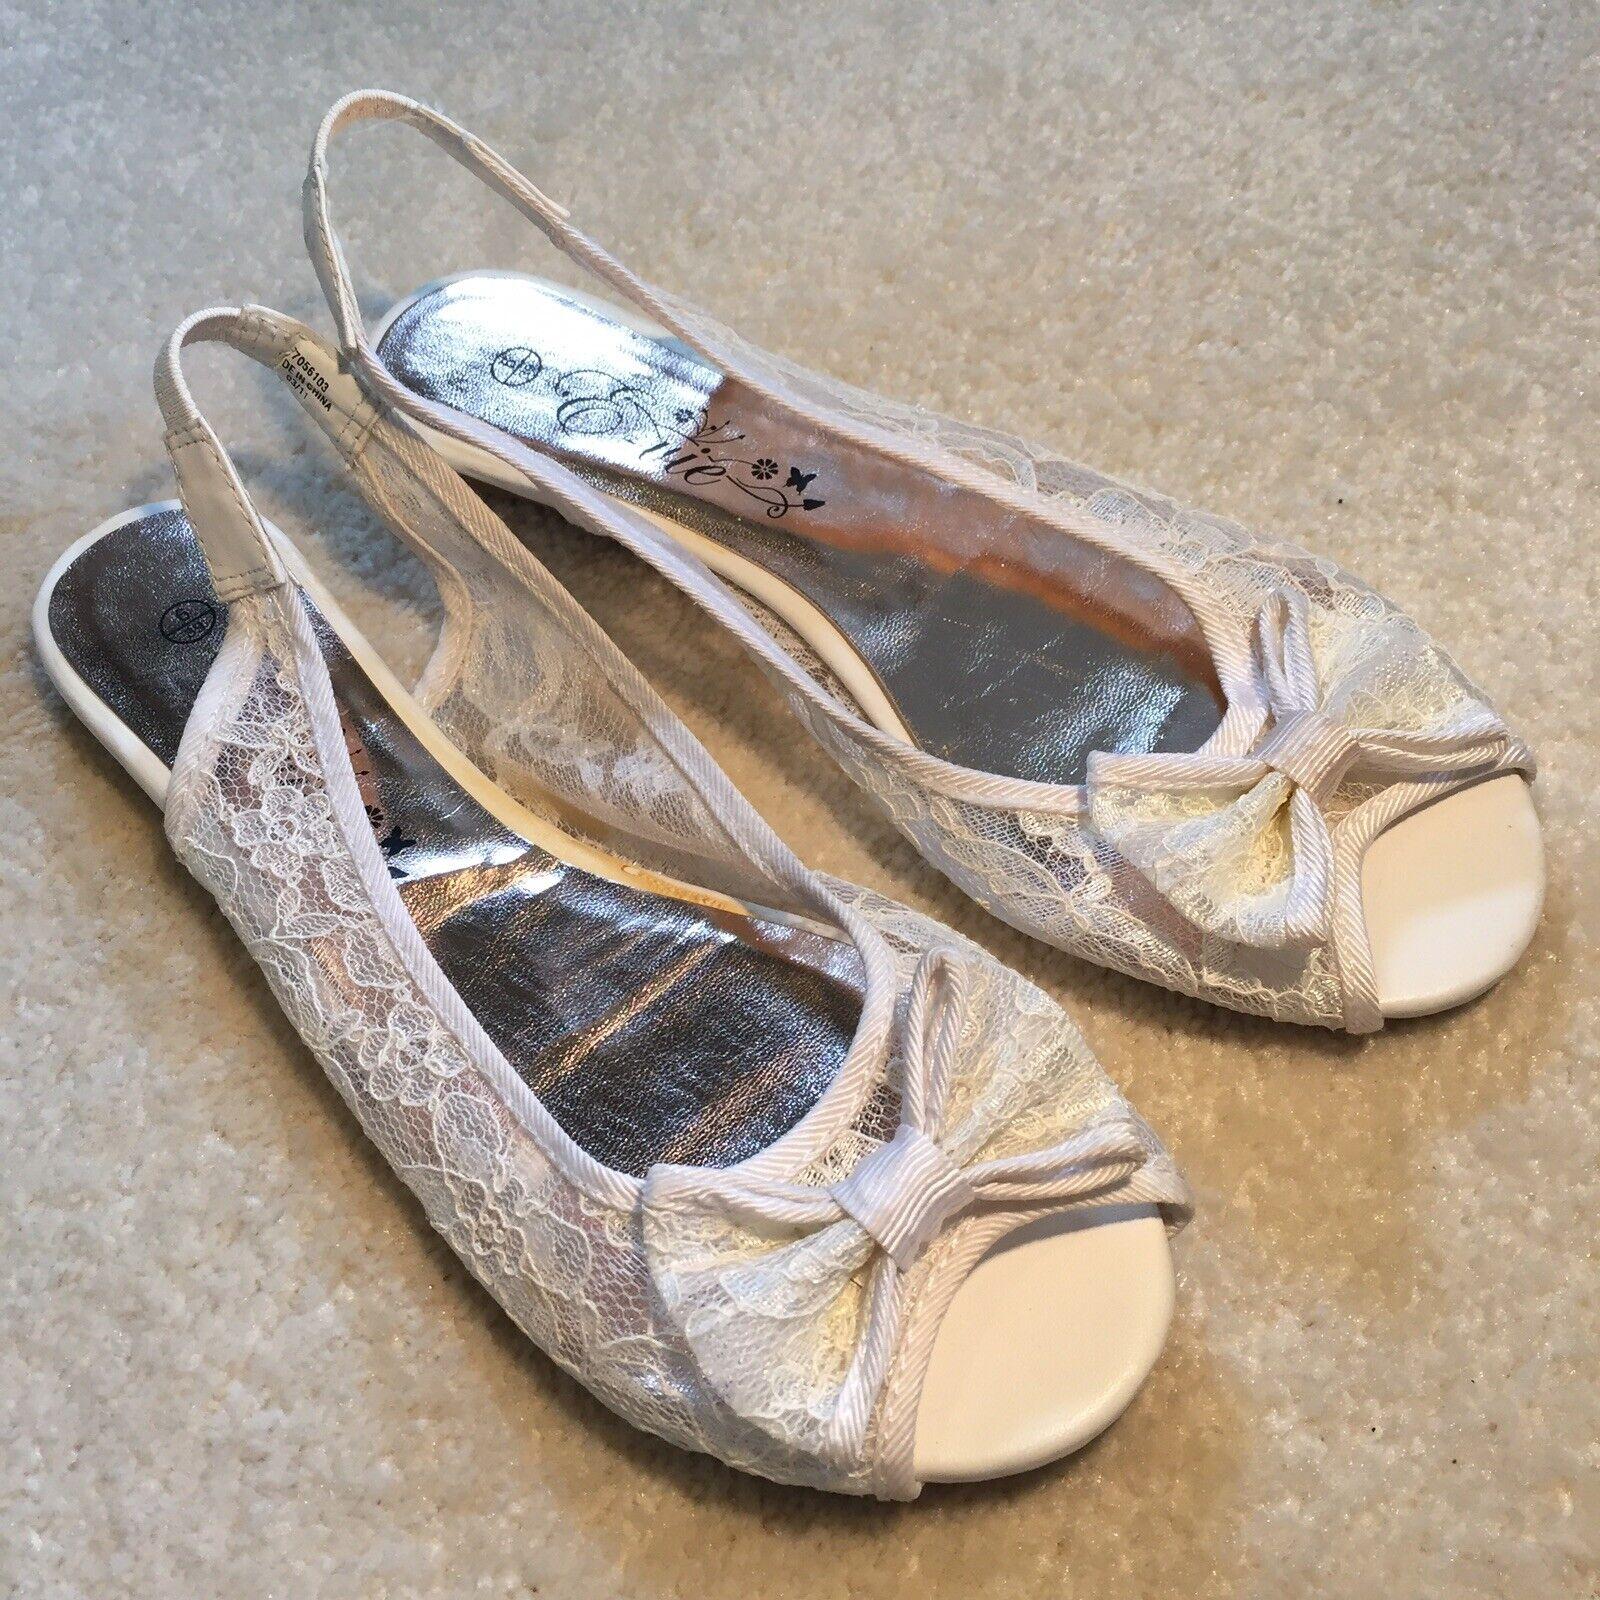 """E-vie"" Ladies Summer Peep Toe Shoes - White Lace + Bow - UK Size 6 EUR 39 - New"